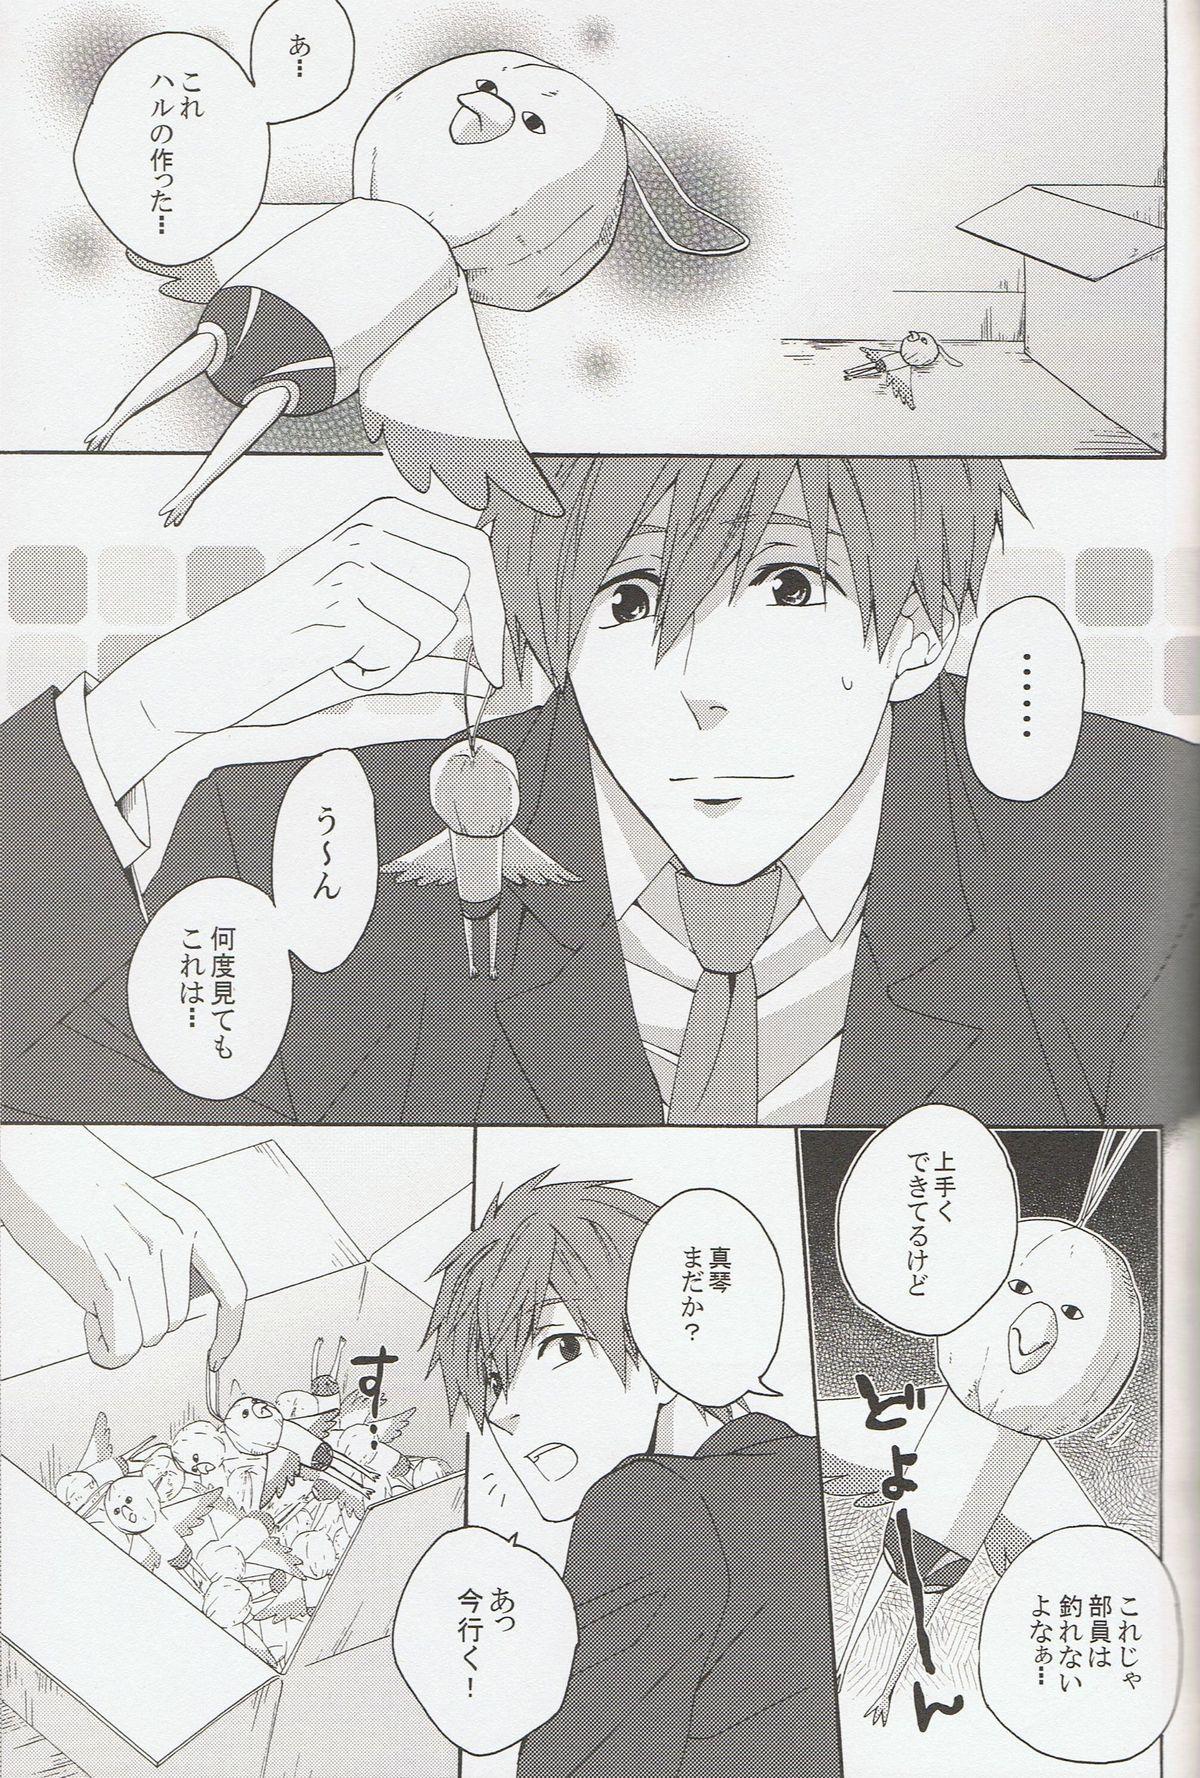 Furikaereba Iwatobi-chan 3